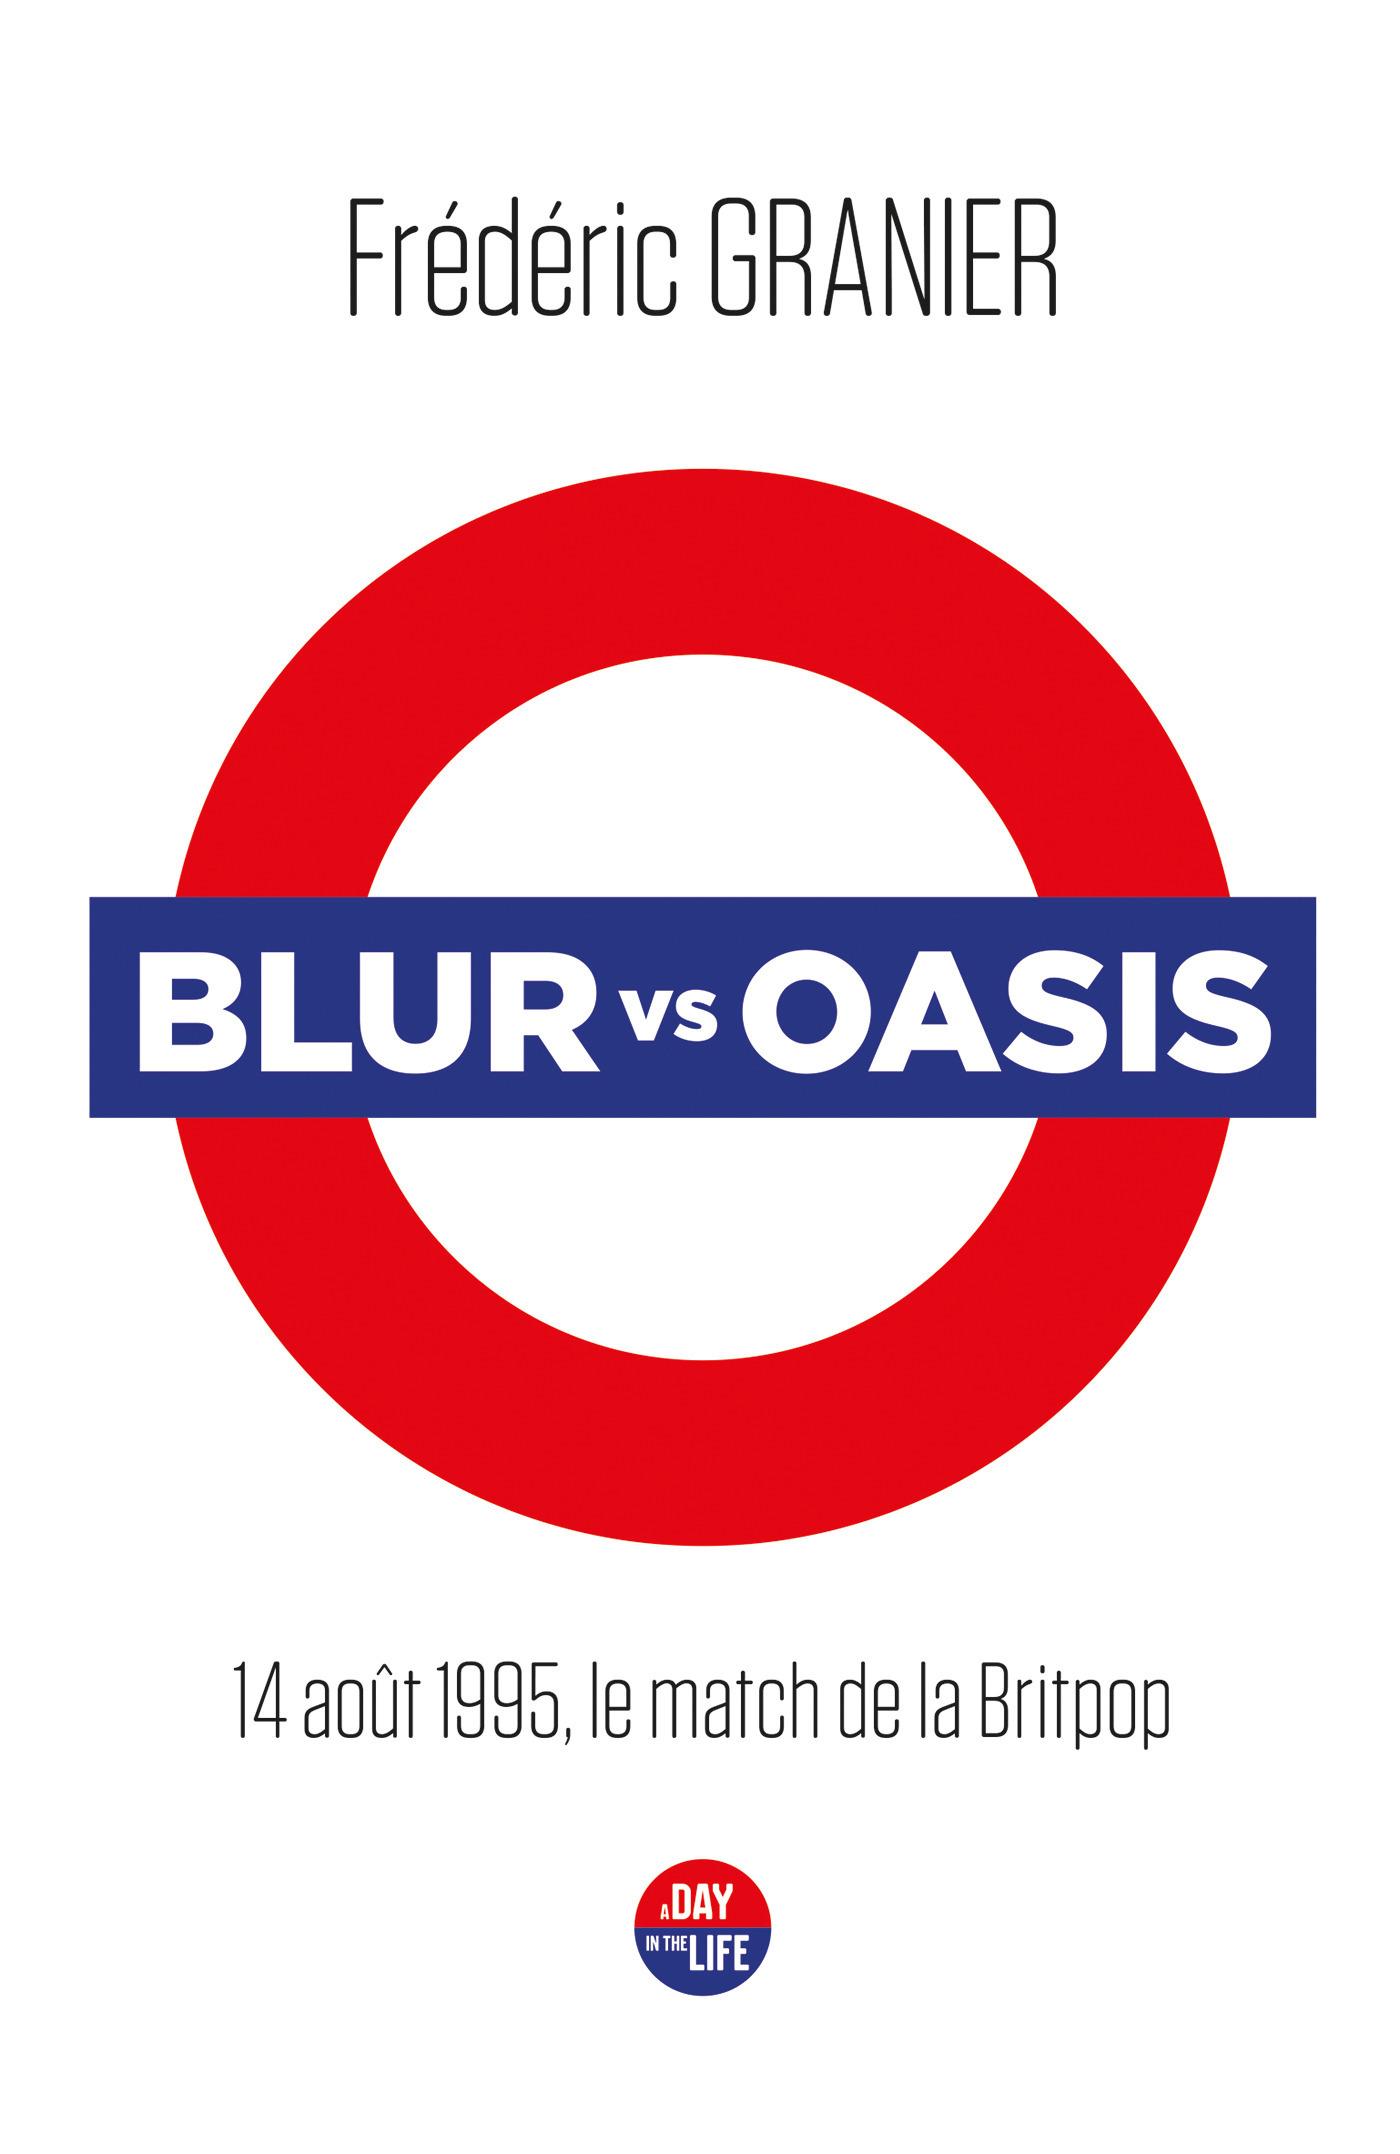 Blur vs Oasis